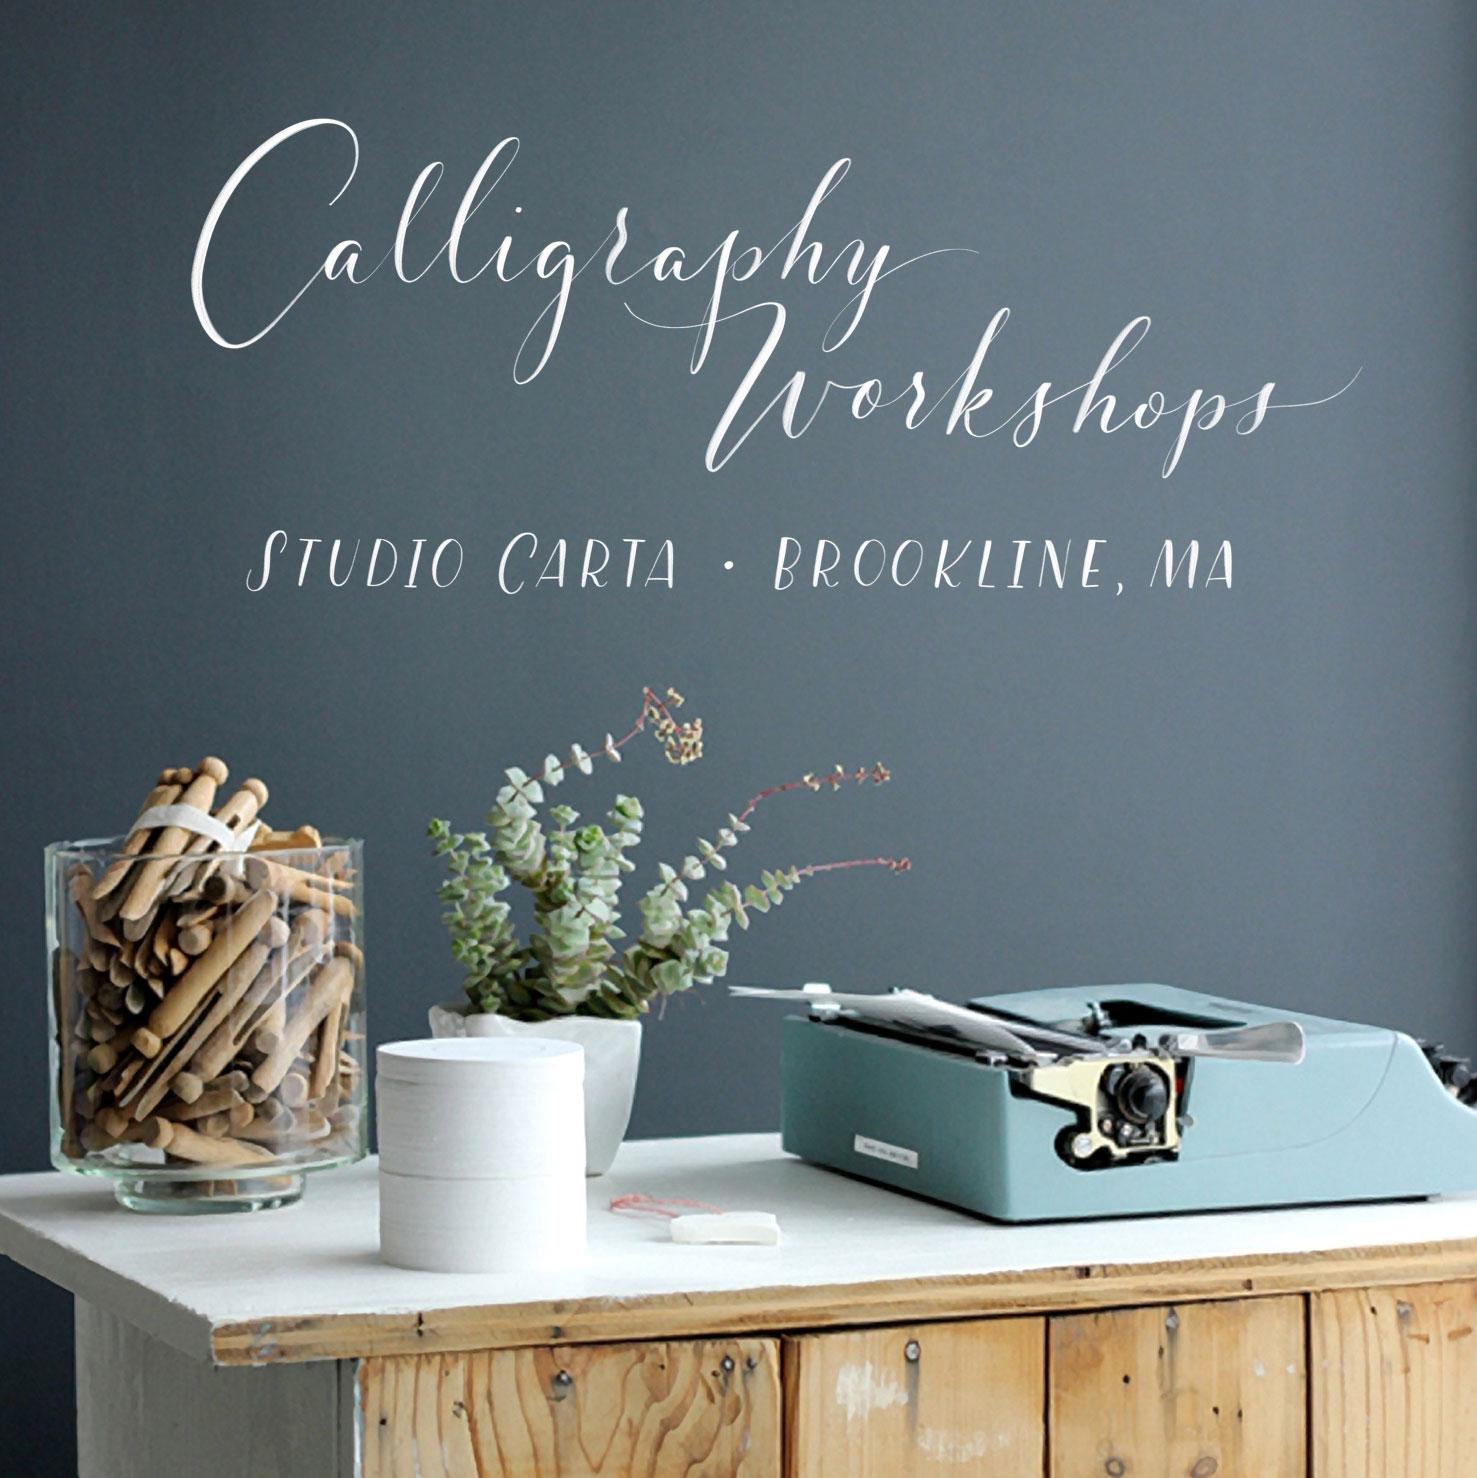 Calligraphy-Workshop-Plurabelle-Boston-Studio-Carta-03.jpg